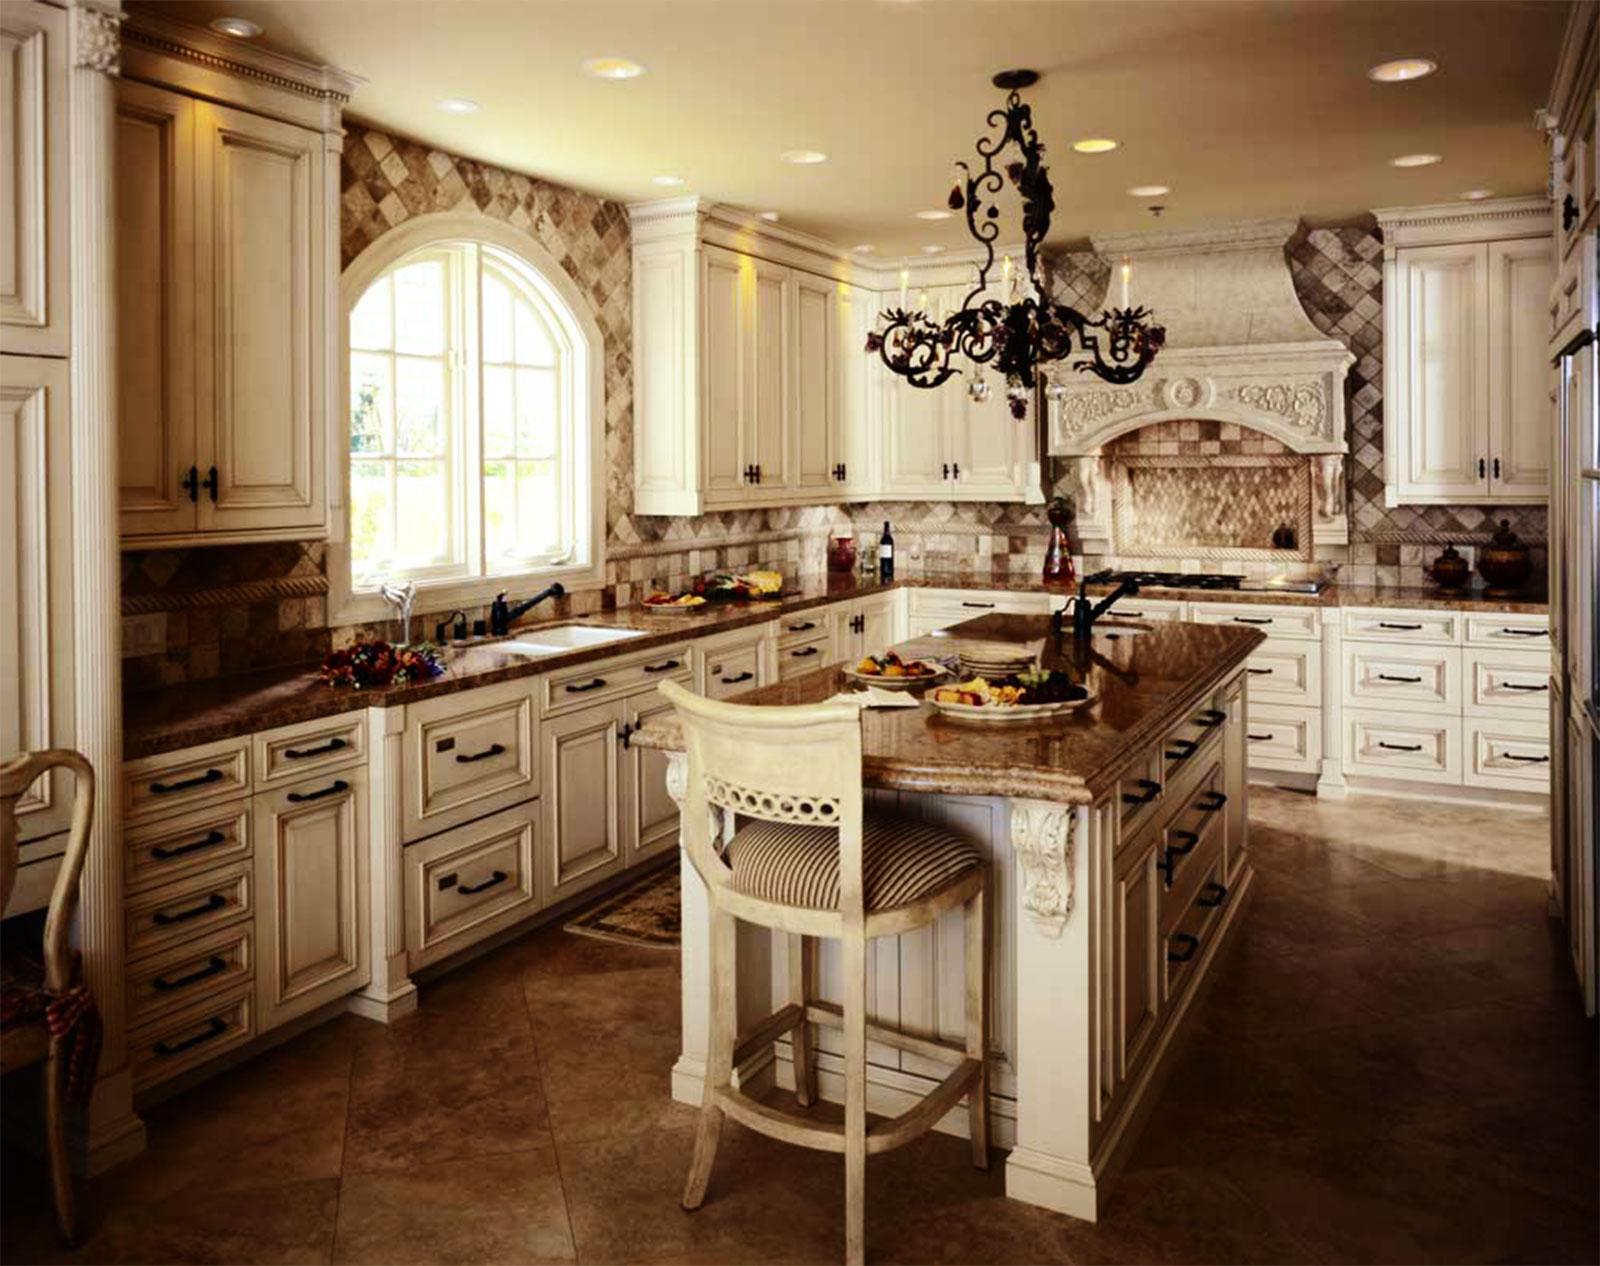 rustic kitchen cabinets rustic kitchen cabinets rustic kitchen cabinets